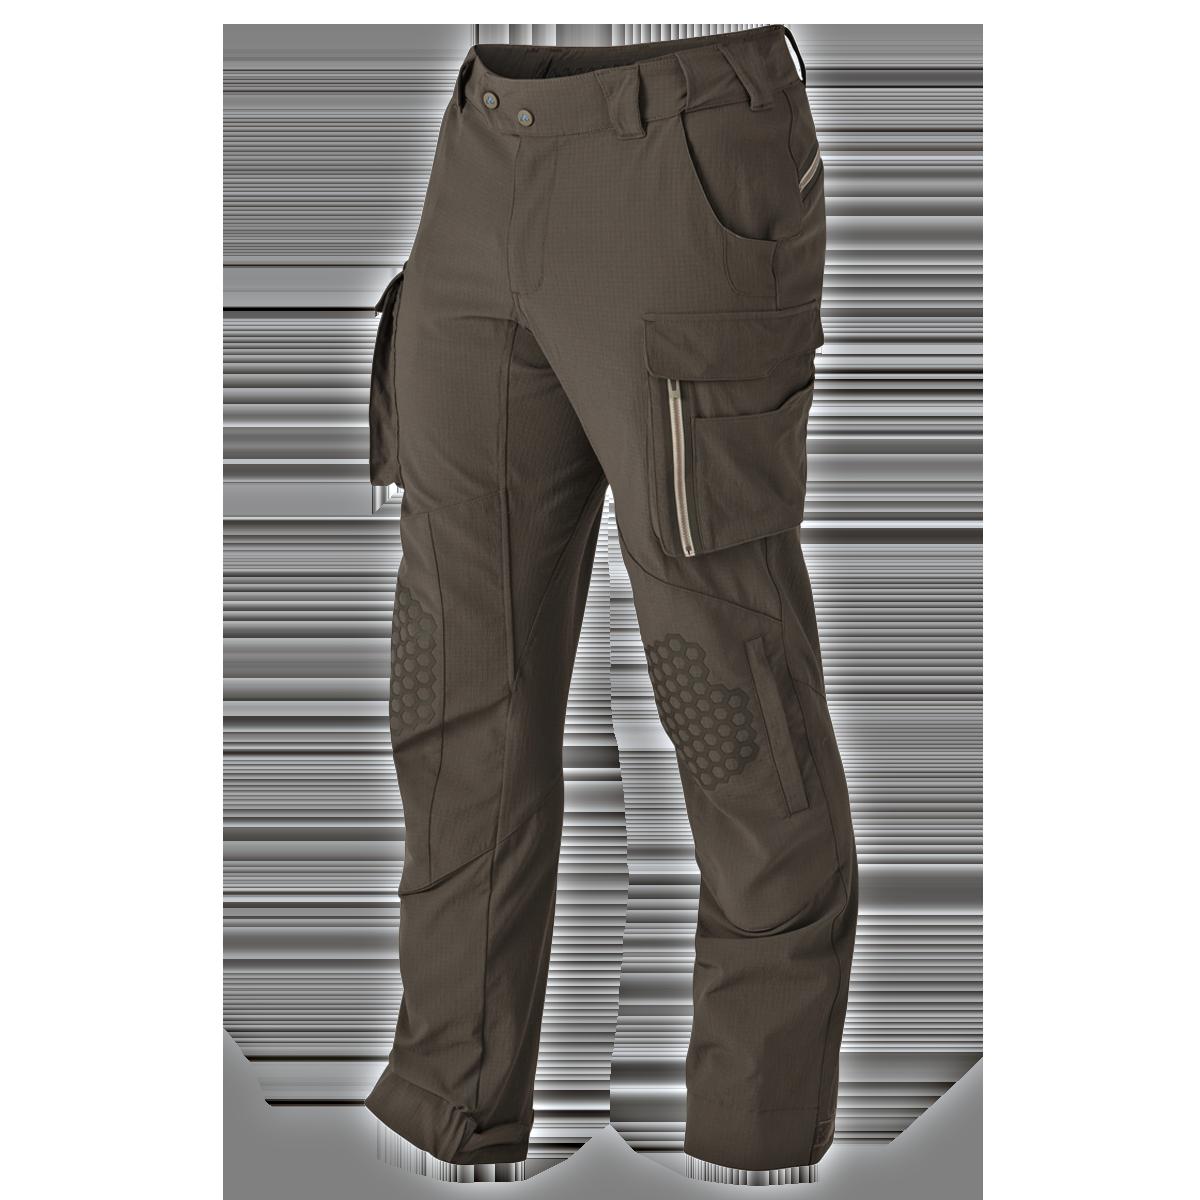 Jeans clipart long pants. Tenacity performance outdoor pant